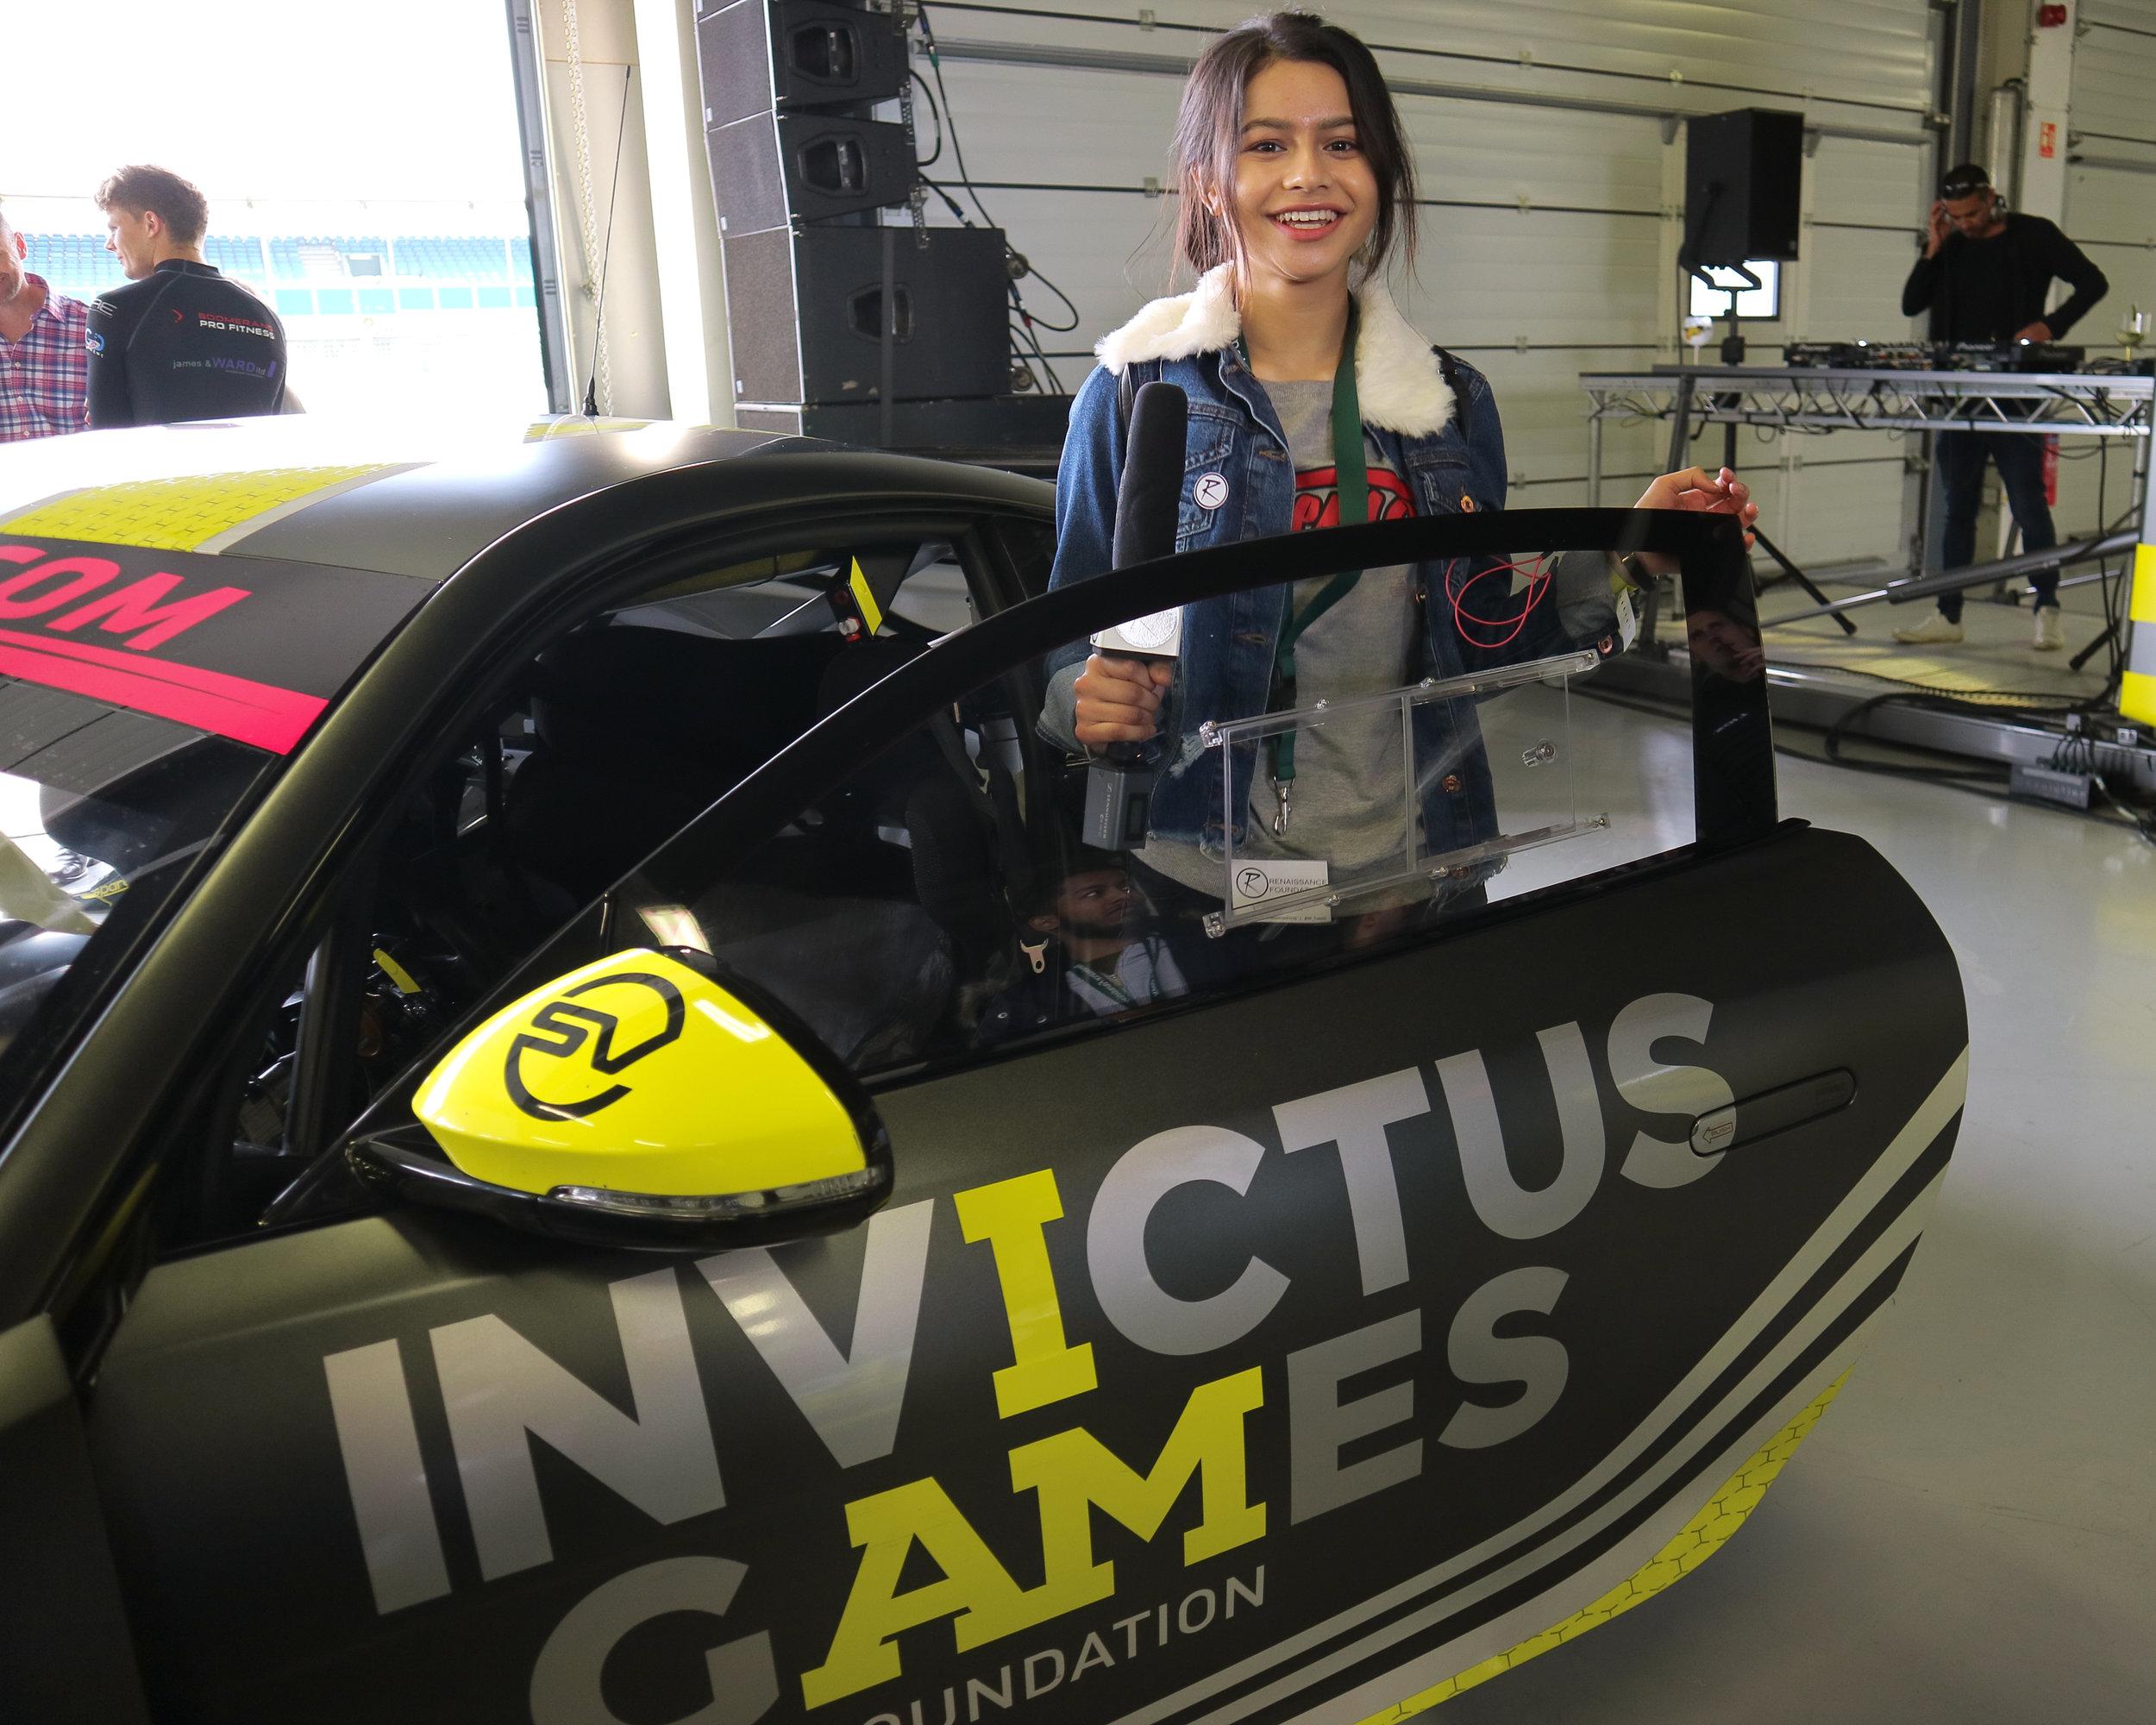 Racing at Invictus